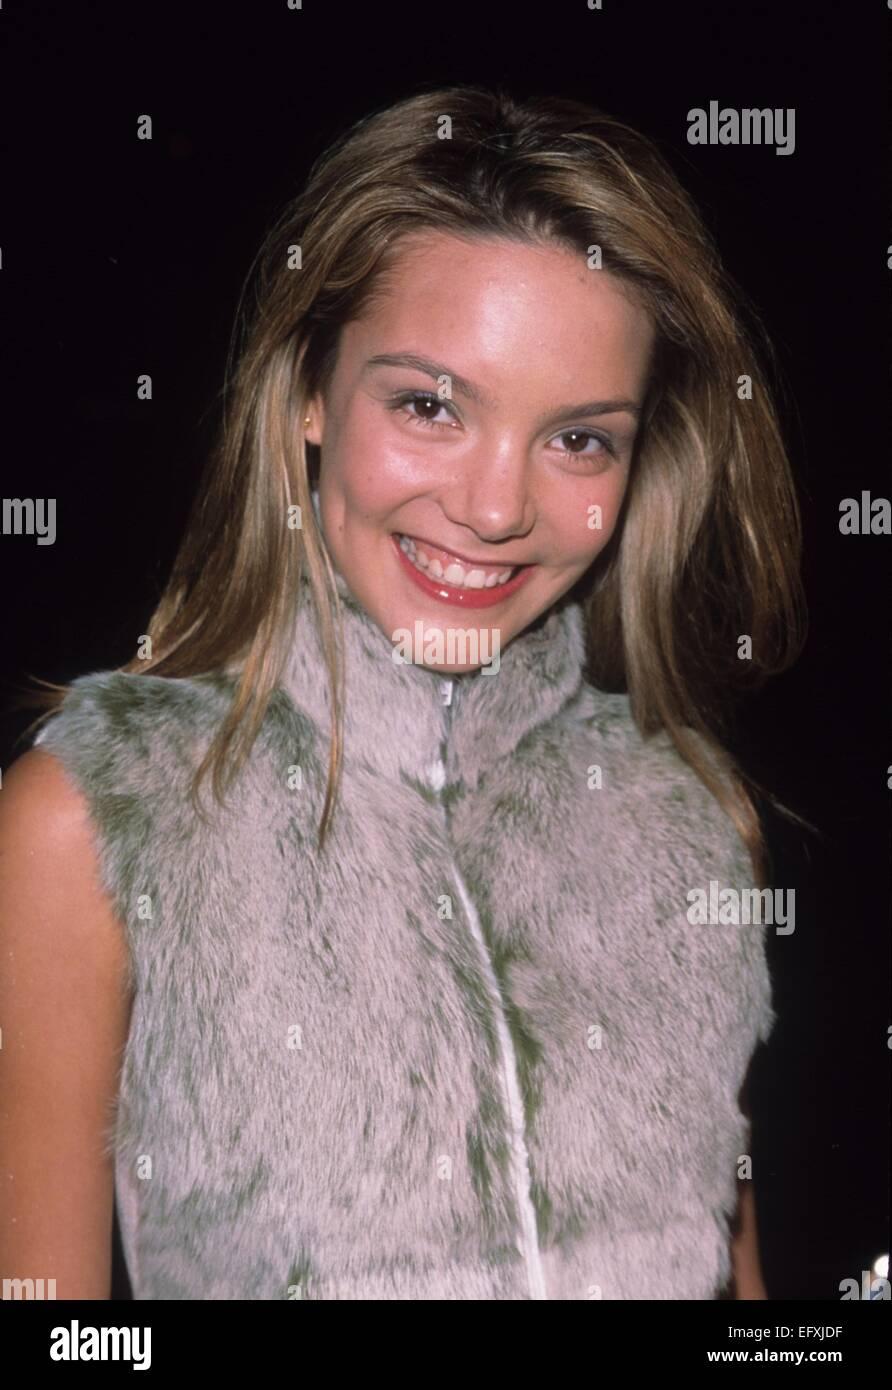 Susan Fleetwood,Natalie Hall born January 25, 1990 (age 28) Adult images Mahima Silwal,Johann Carlo